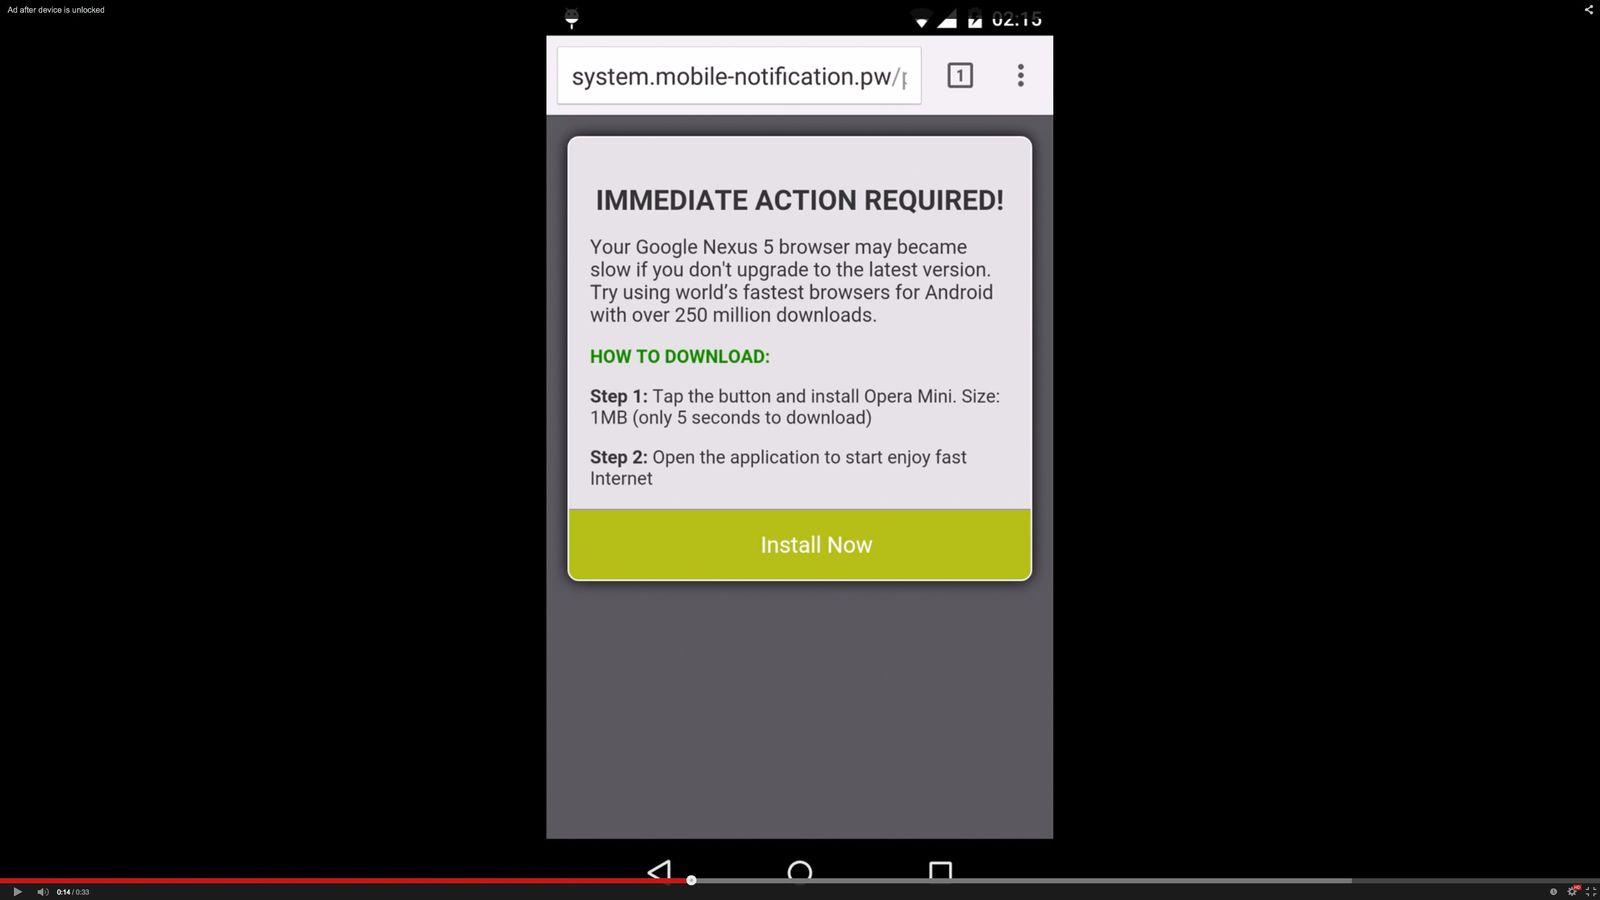 NUR ALS ZITAT Screenshot/ Avast/ Android Adware